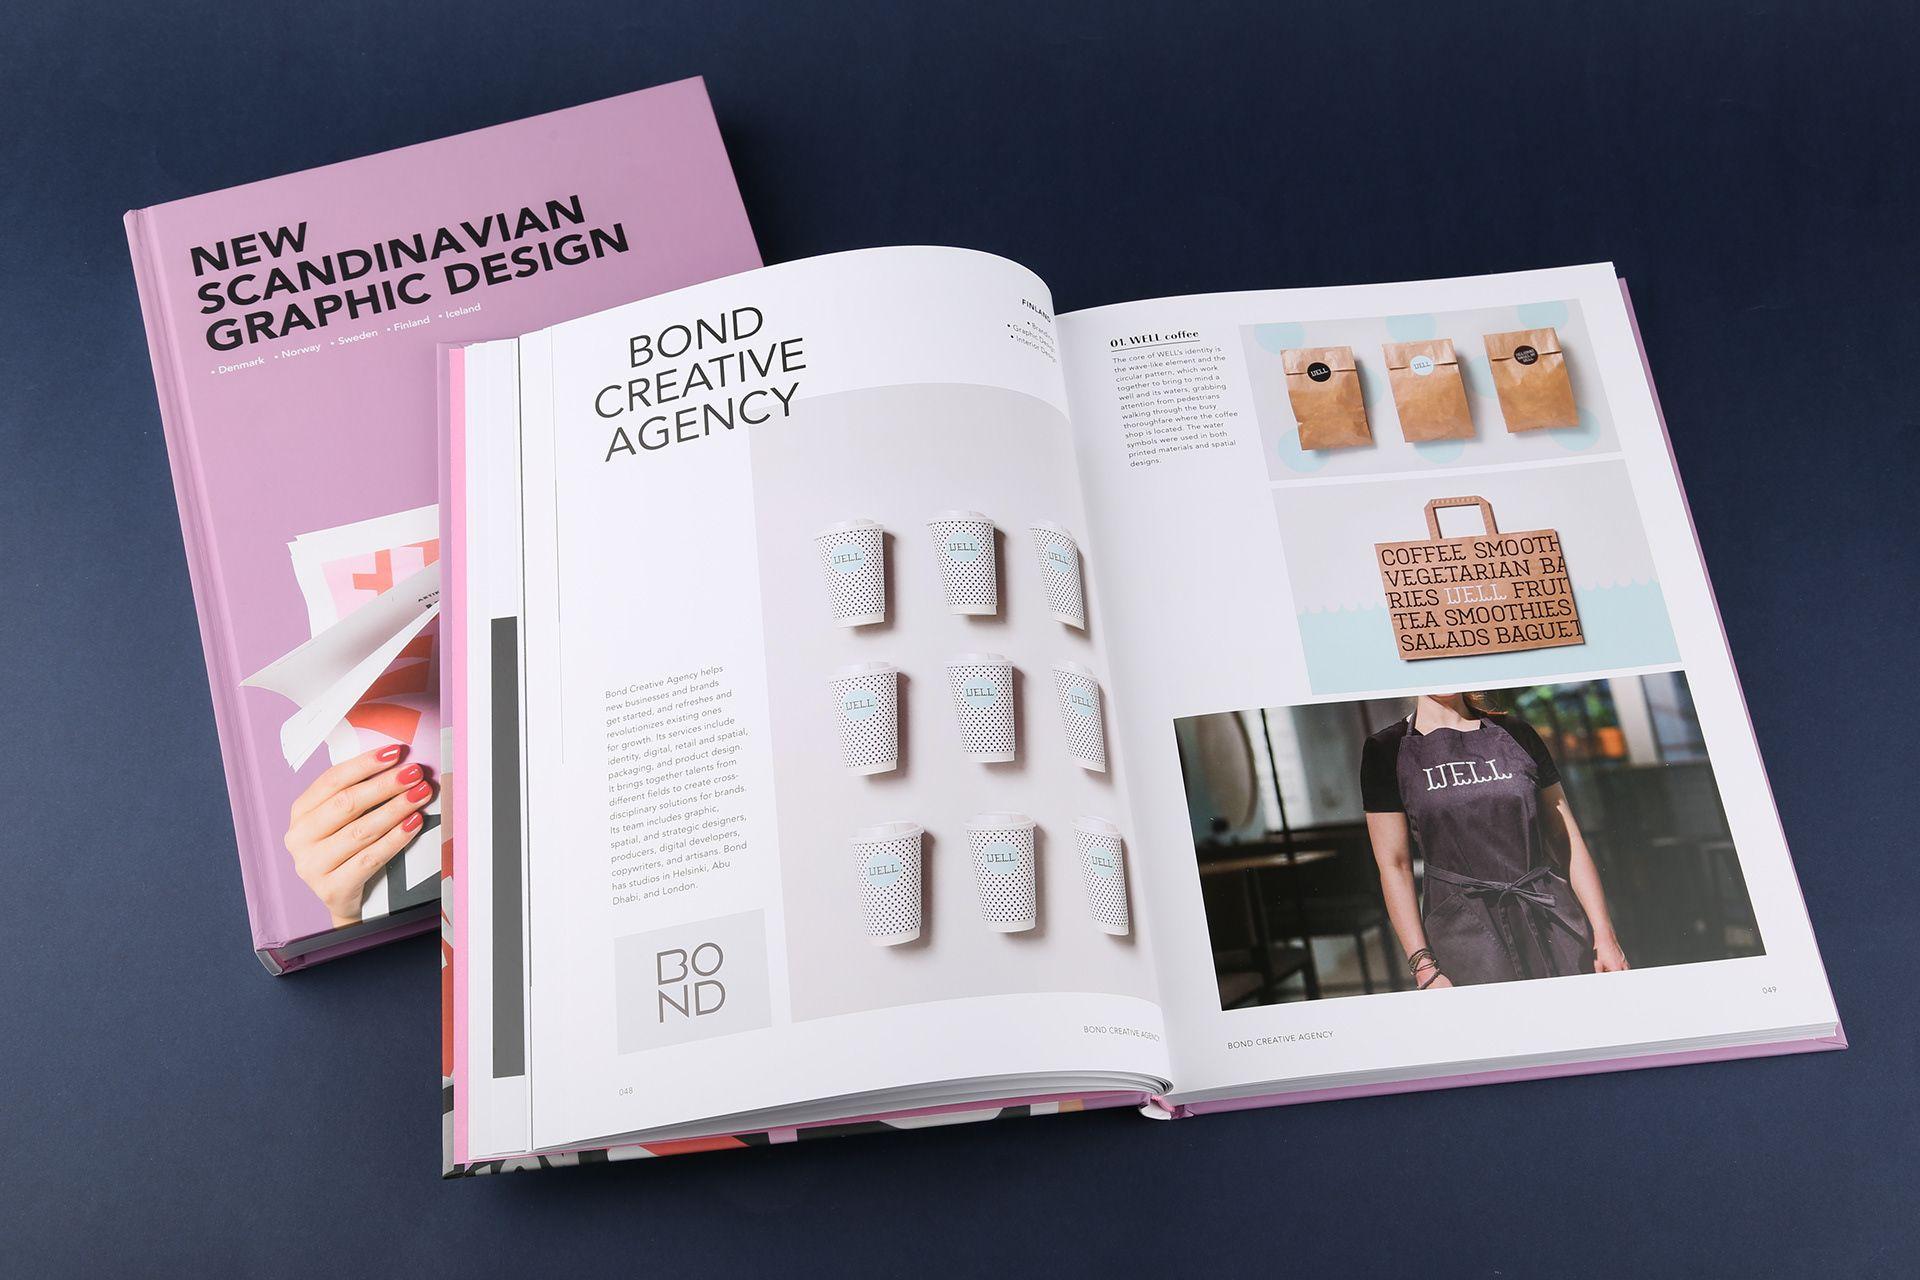 New Scandinavian Graphic Design On Behance